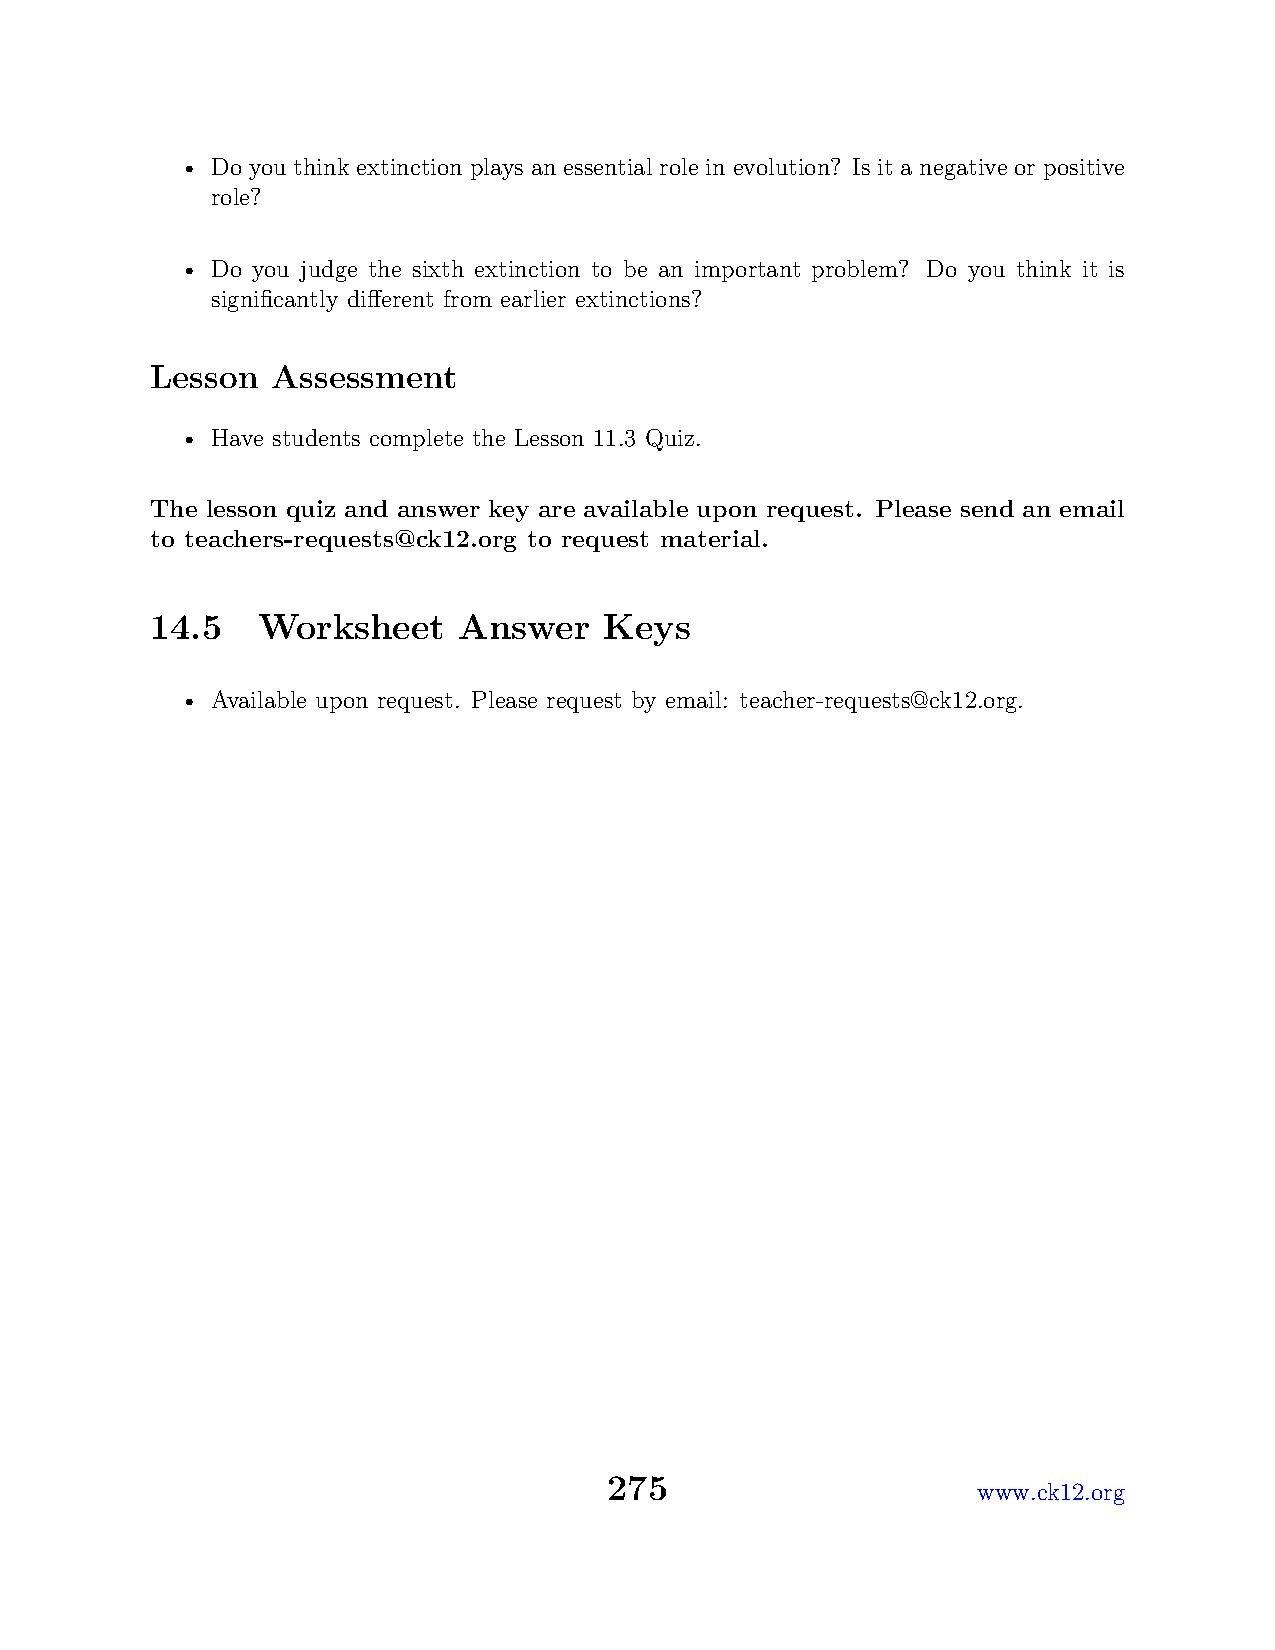 File:High School Biology Teacher's Guide pdf - Wikipedia